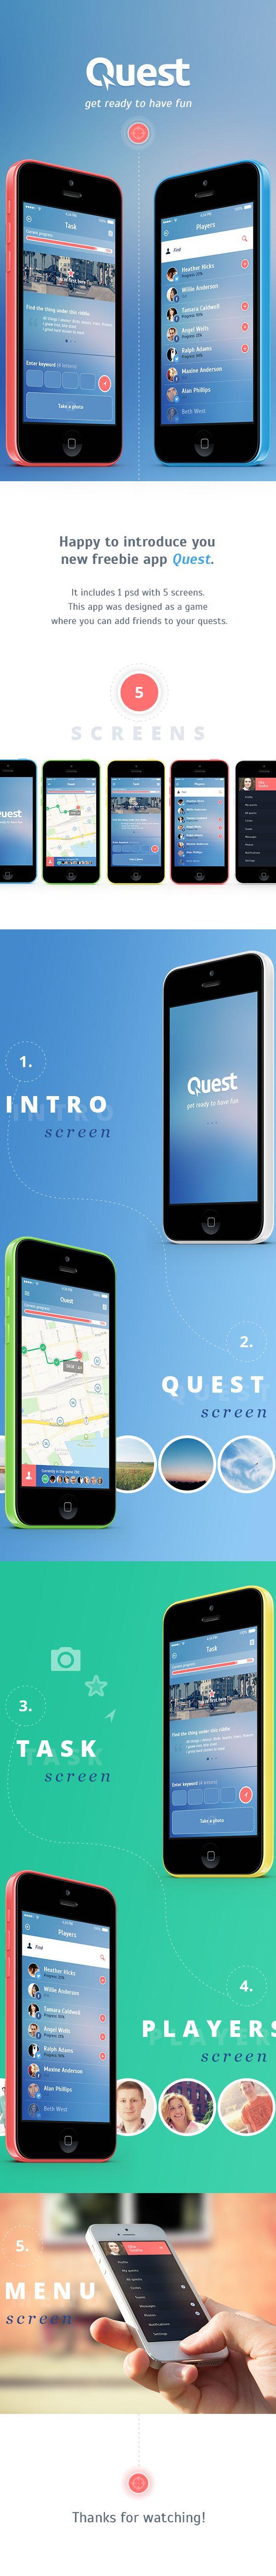 Quest. Free iOS7 App by Olia Gozha, via Behance